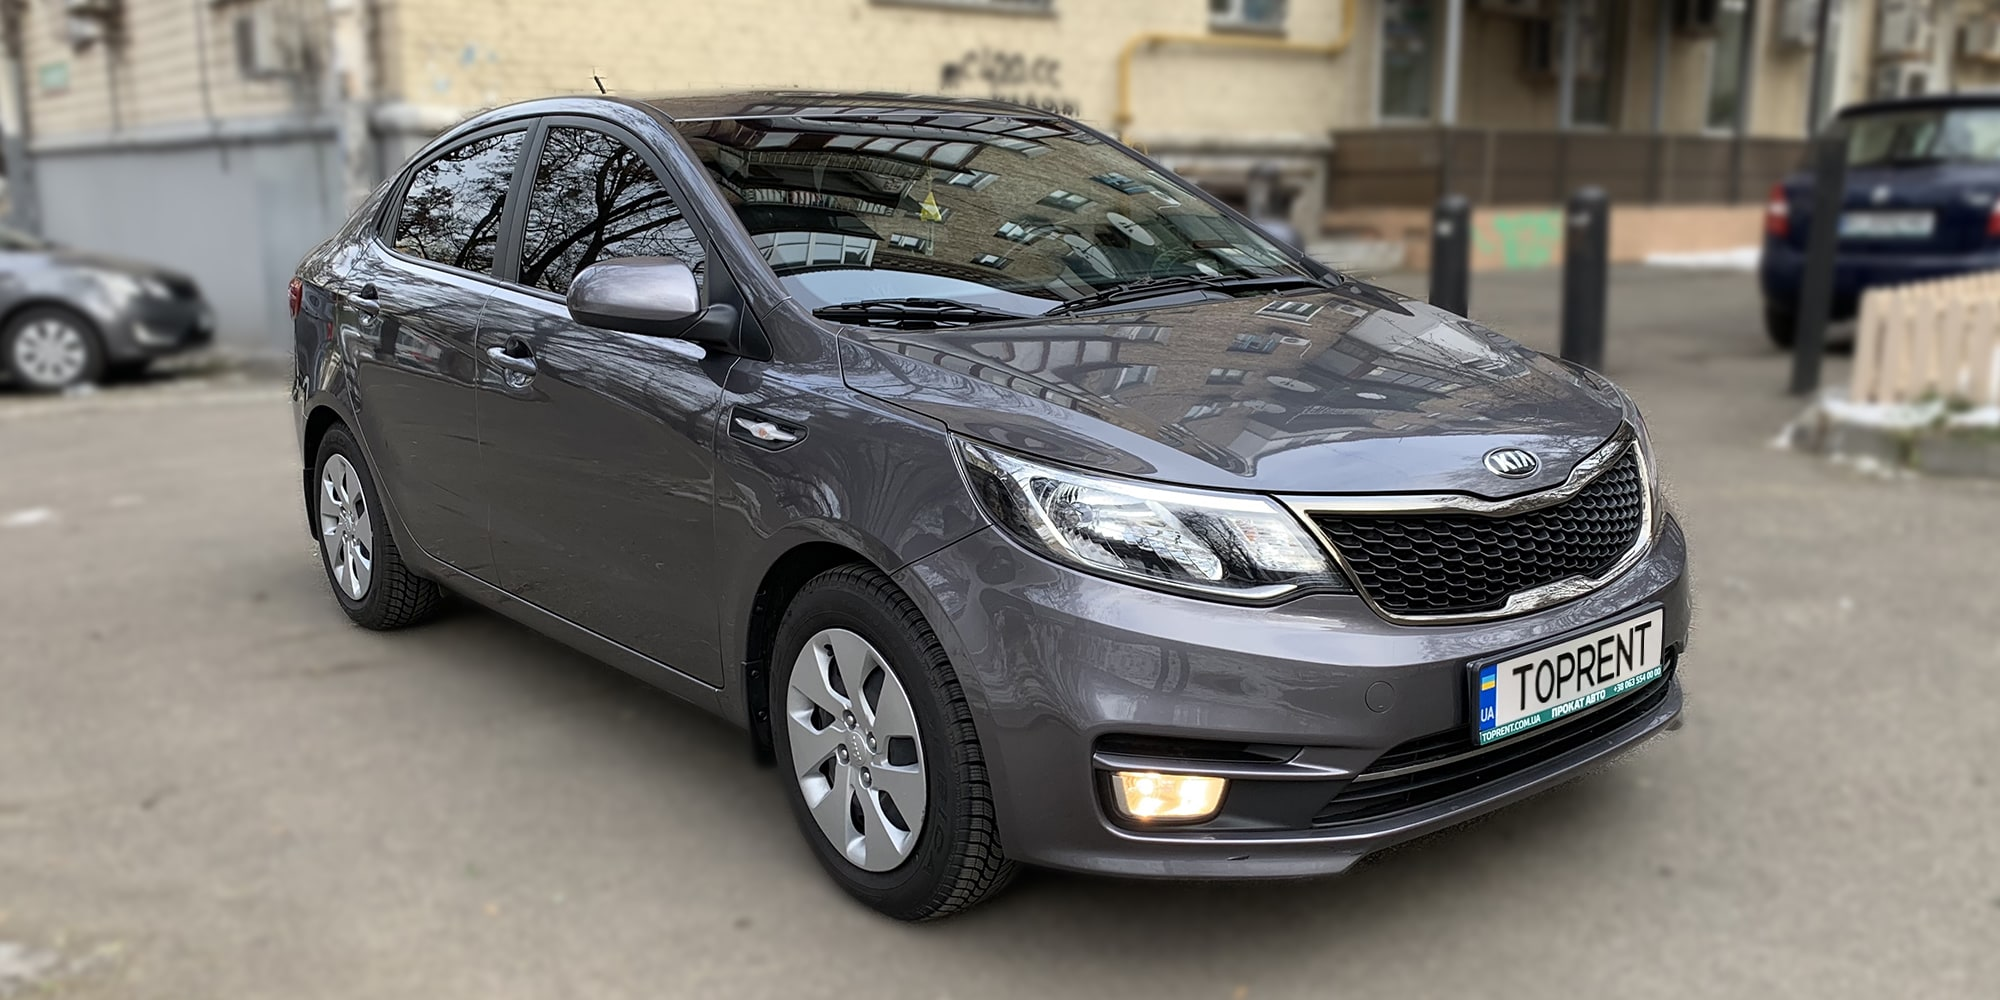 Прокат и аренда авто Kia Rio Sedan 2015 - фото 2 | TOPrent.ua